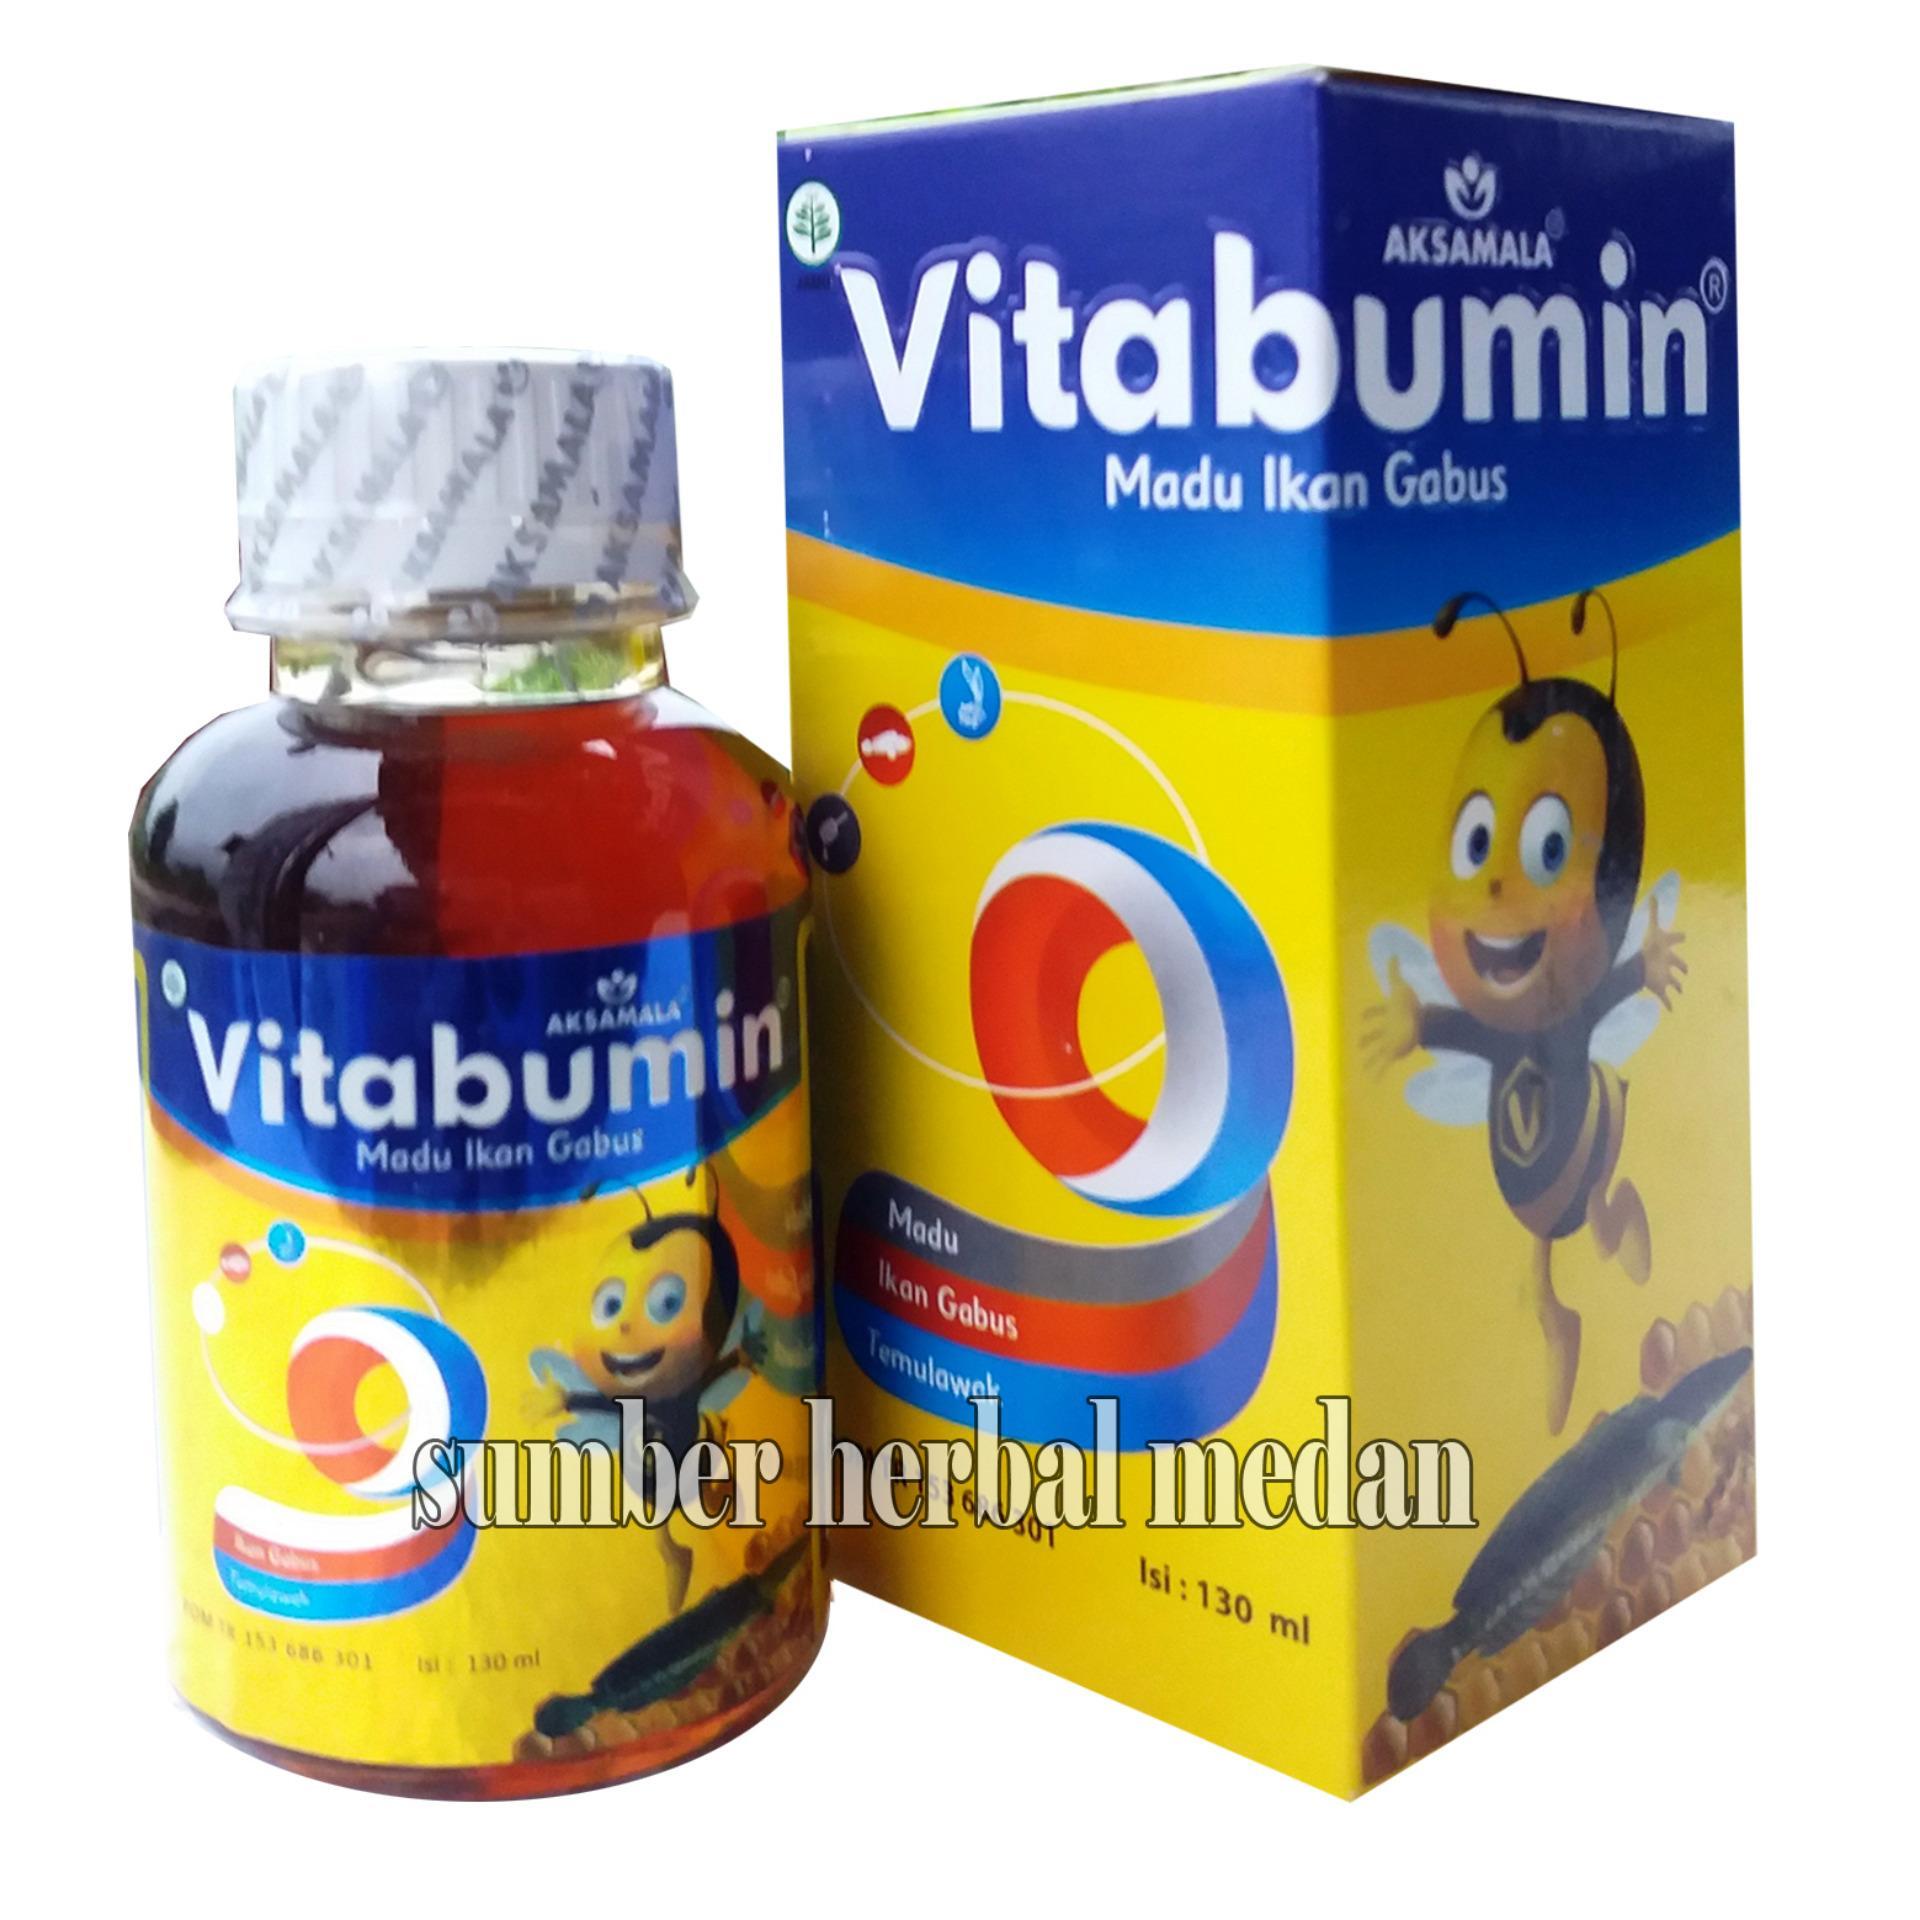 ... Vitabumin Madu Albumin Anak Original Kemasan Baru - 130ml ...